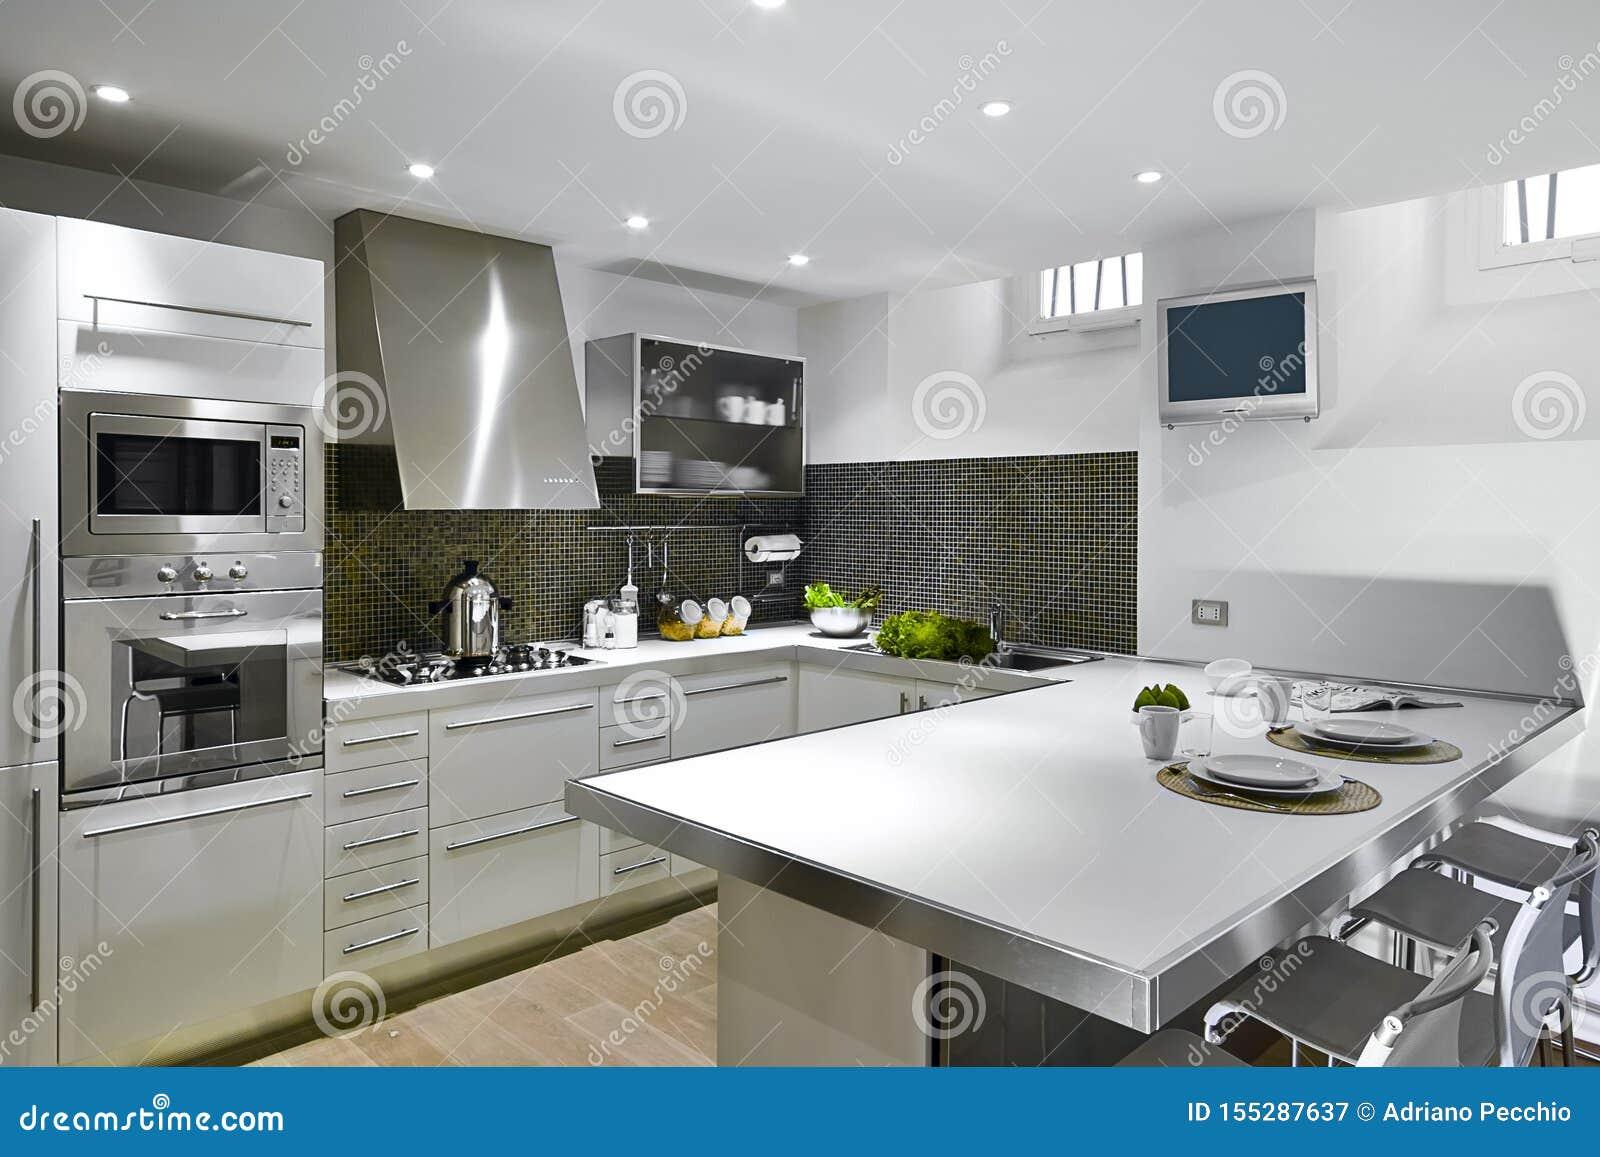 Interiors Shots Of A Modern Kitchen Stock Image Image Of Horizontal Built 155287637